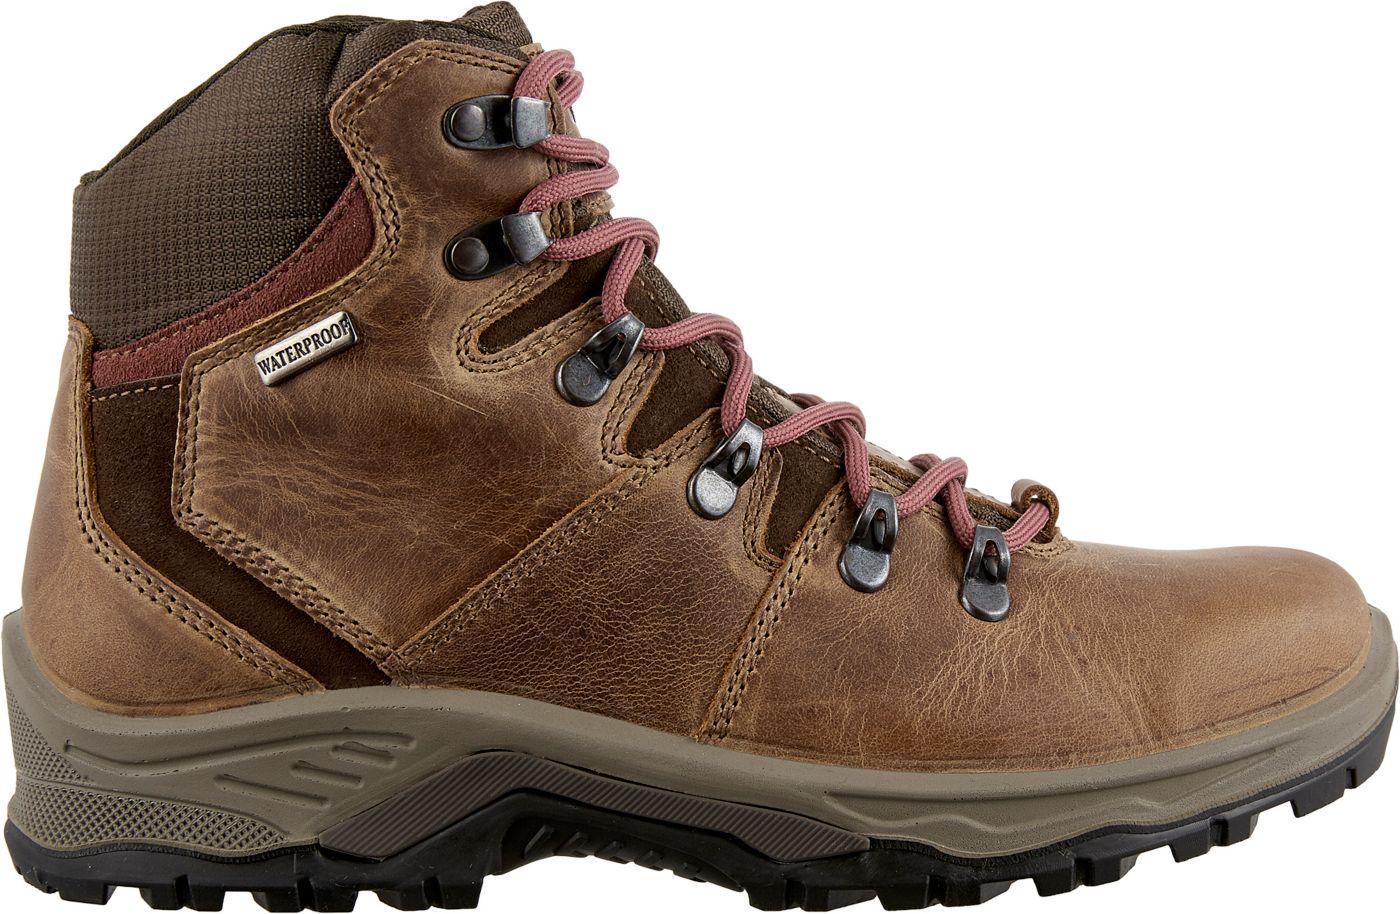 Alpine Design Women's Passare Waterproof Hiking Boots